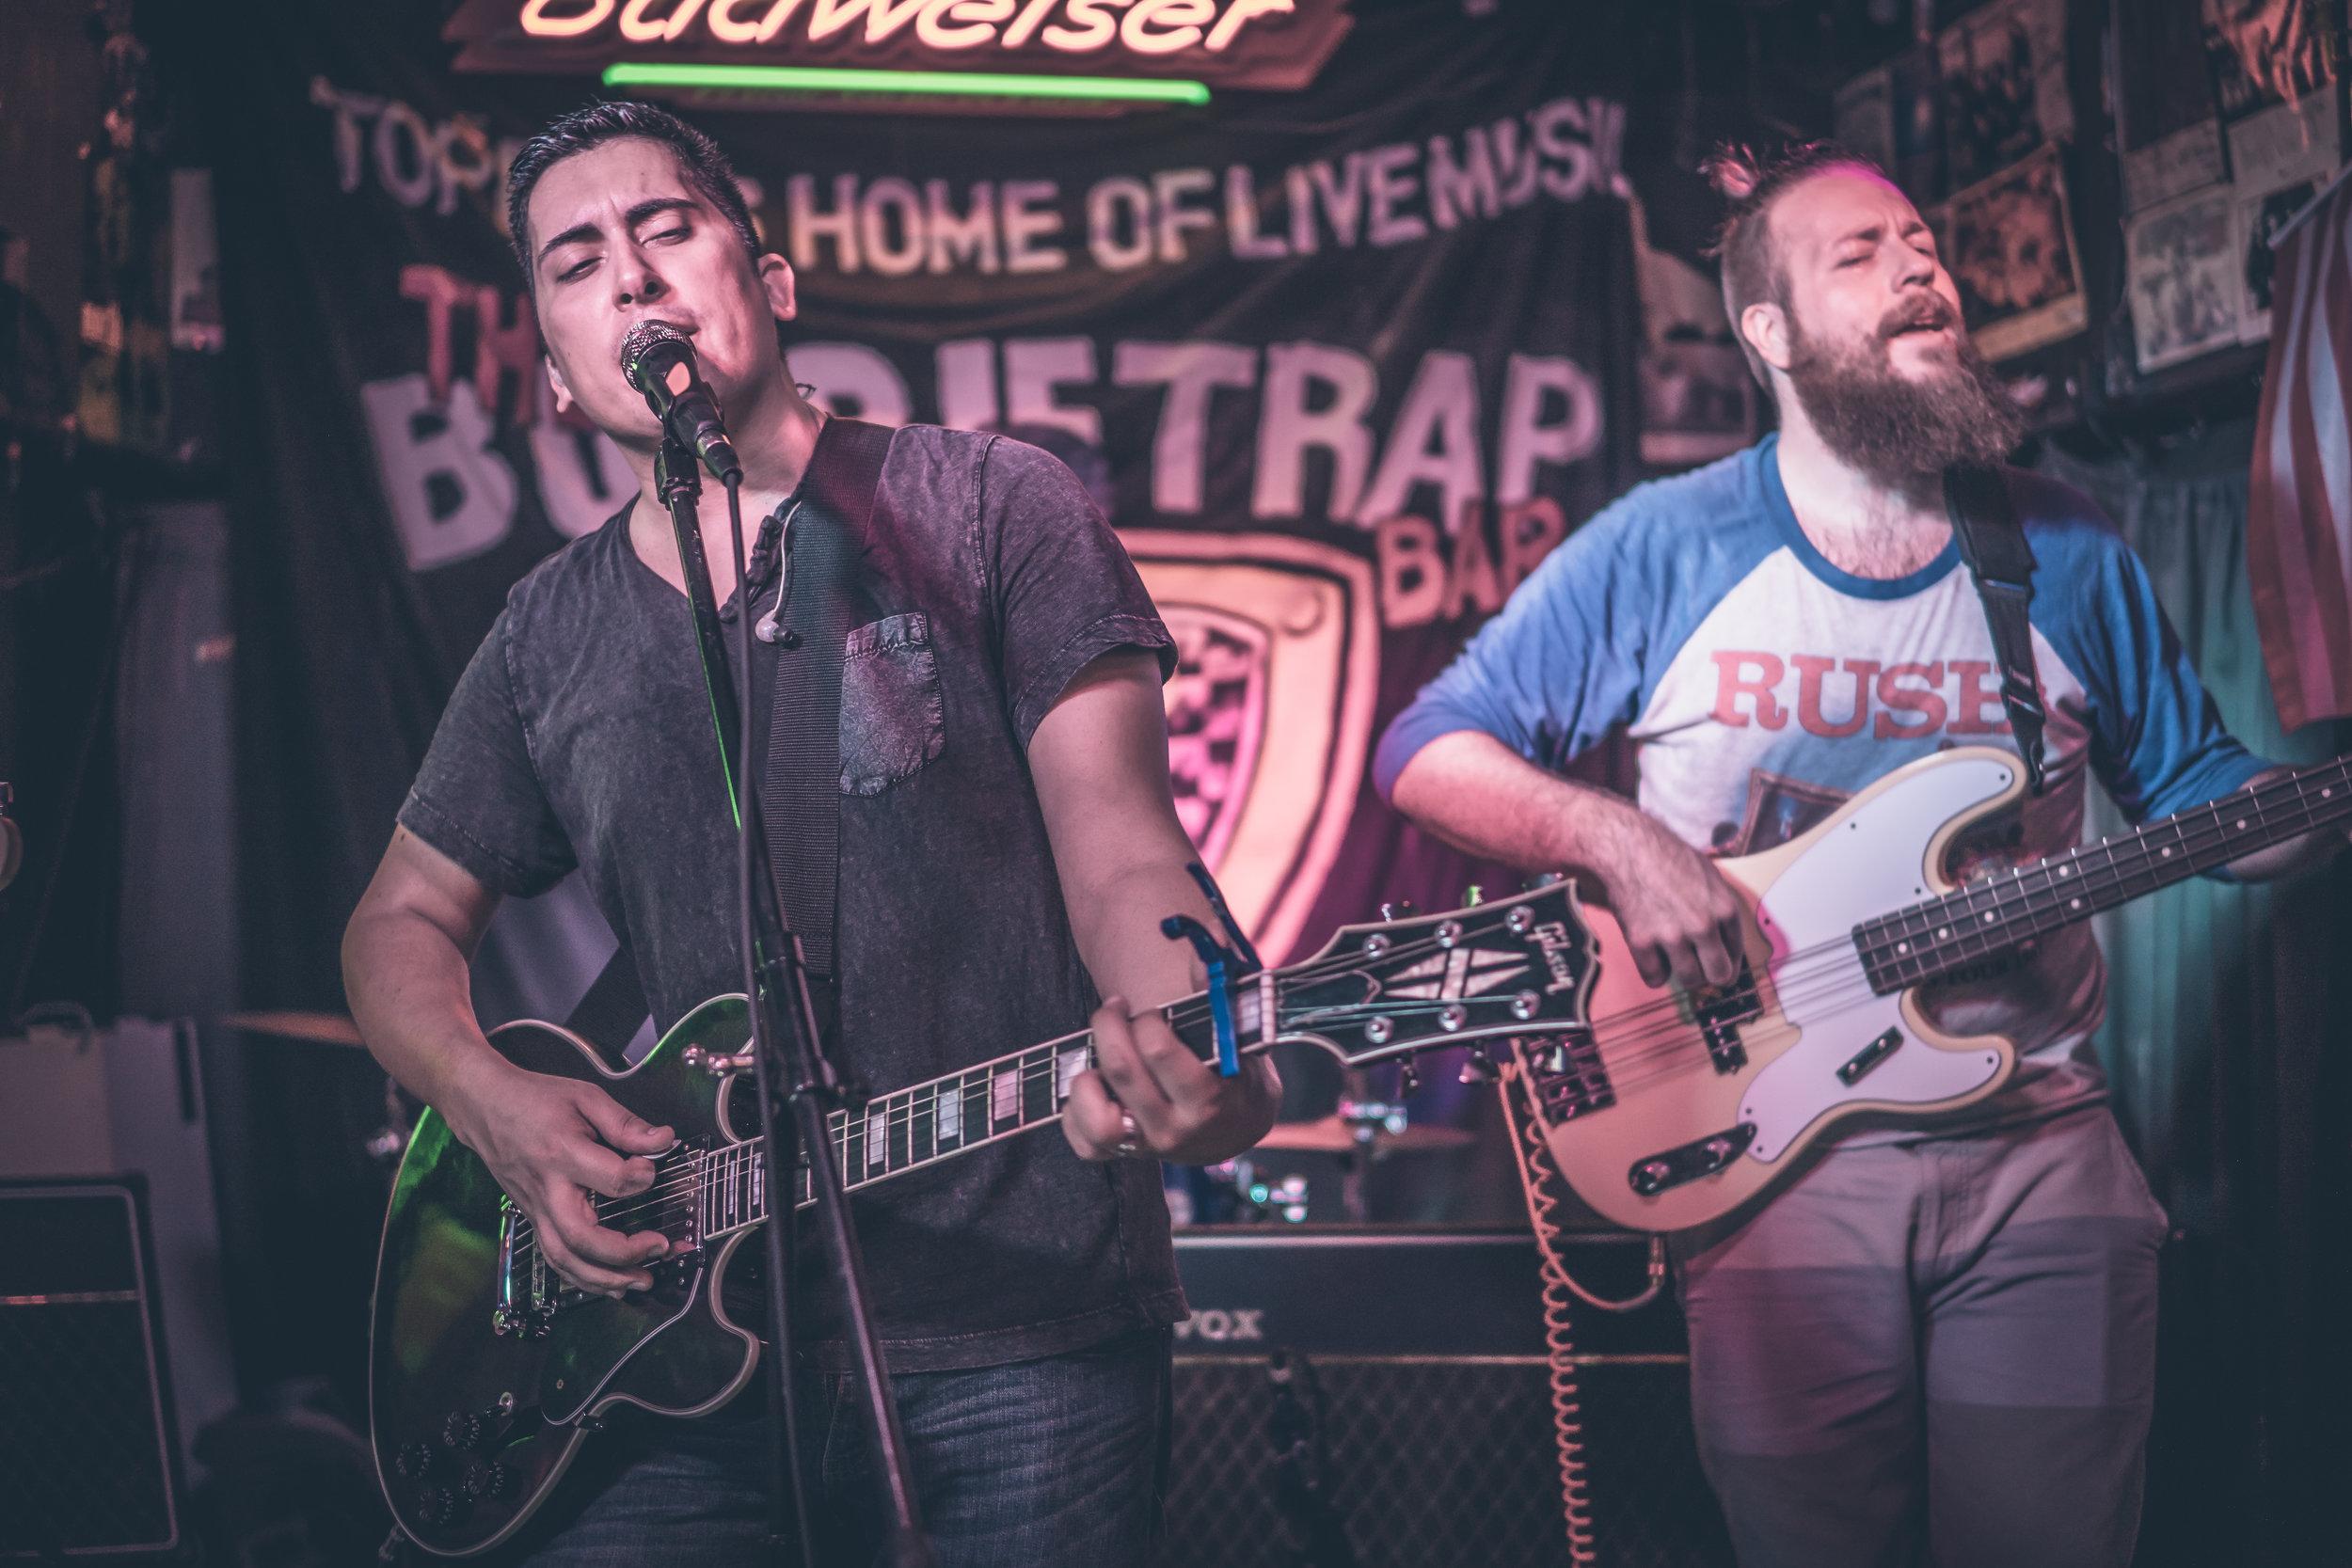 FM Pilots - Tulsa Rock Band - The Boobie Trap Bar Topeka, KS 070916-14.jpg